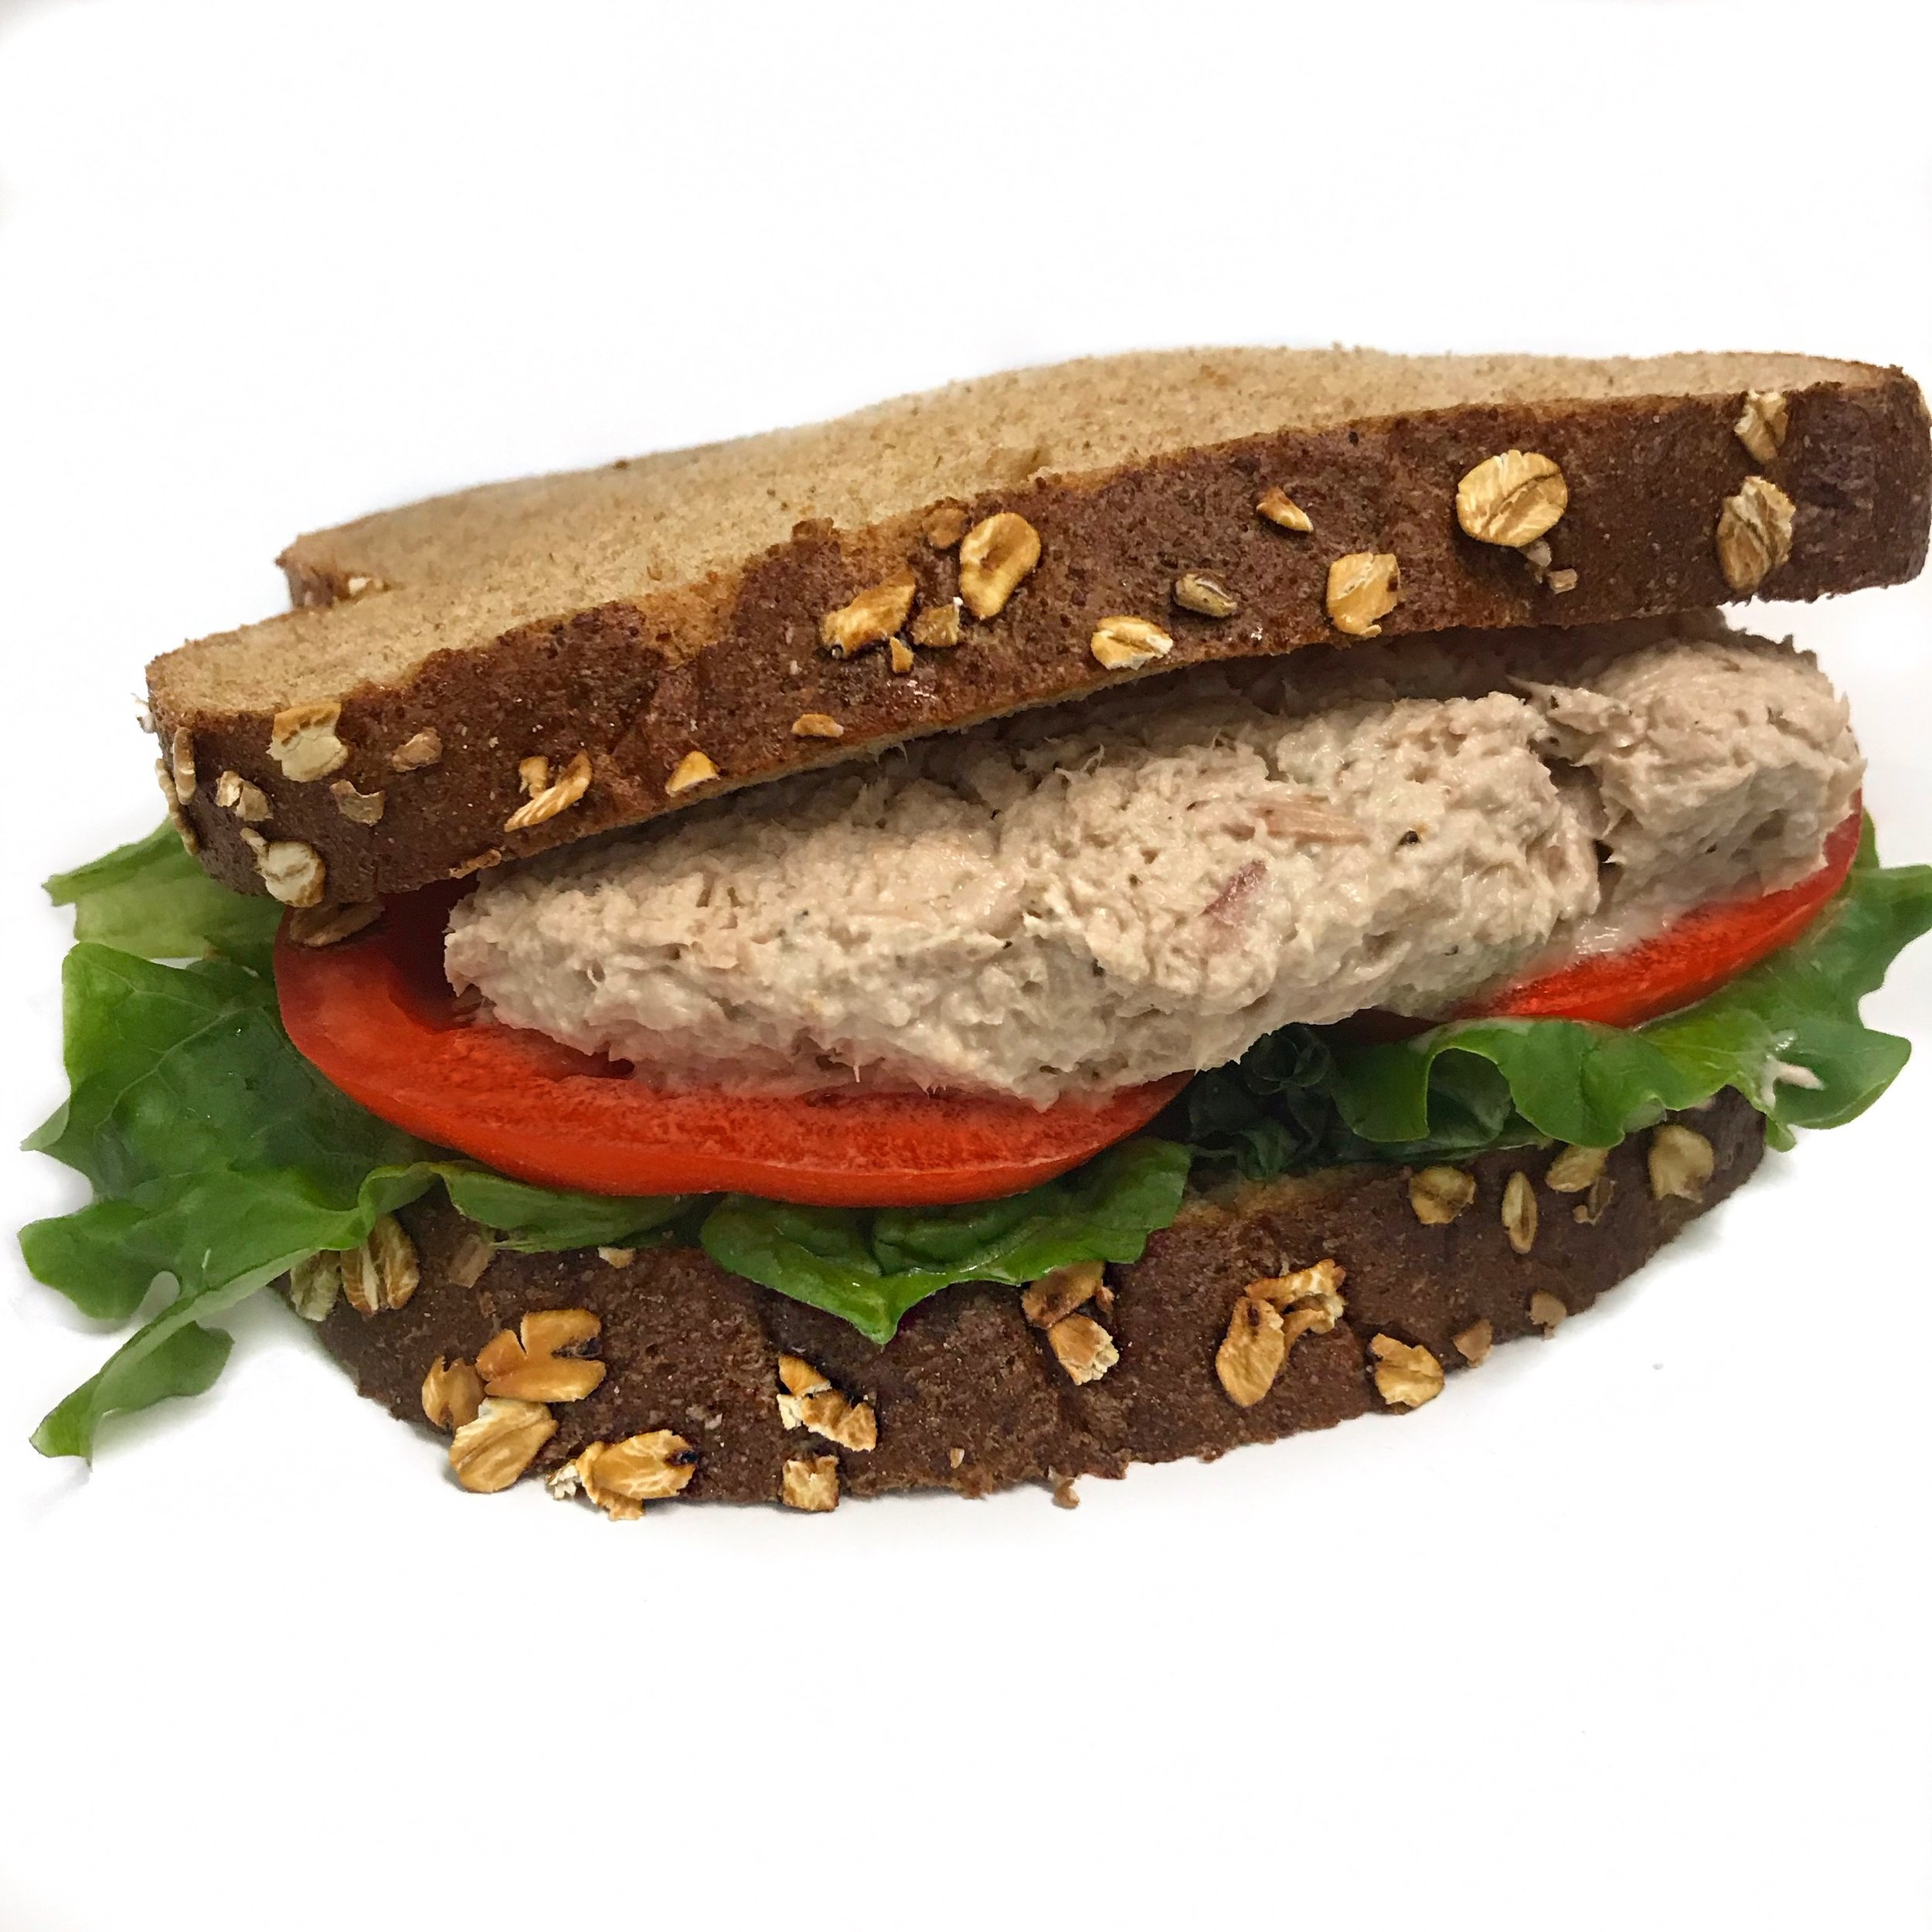 Tuna Salad Sandwich    Homemade Tuna Salad, Lettuce, Tomato on Rustic Whole Wheat